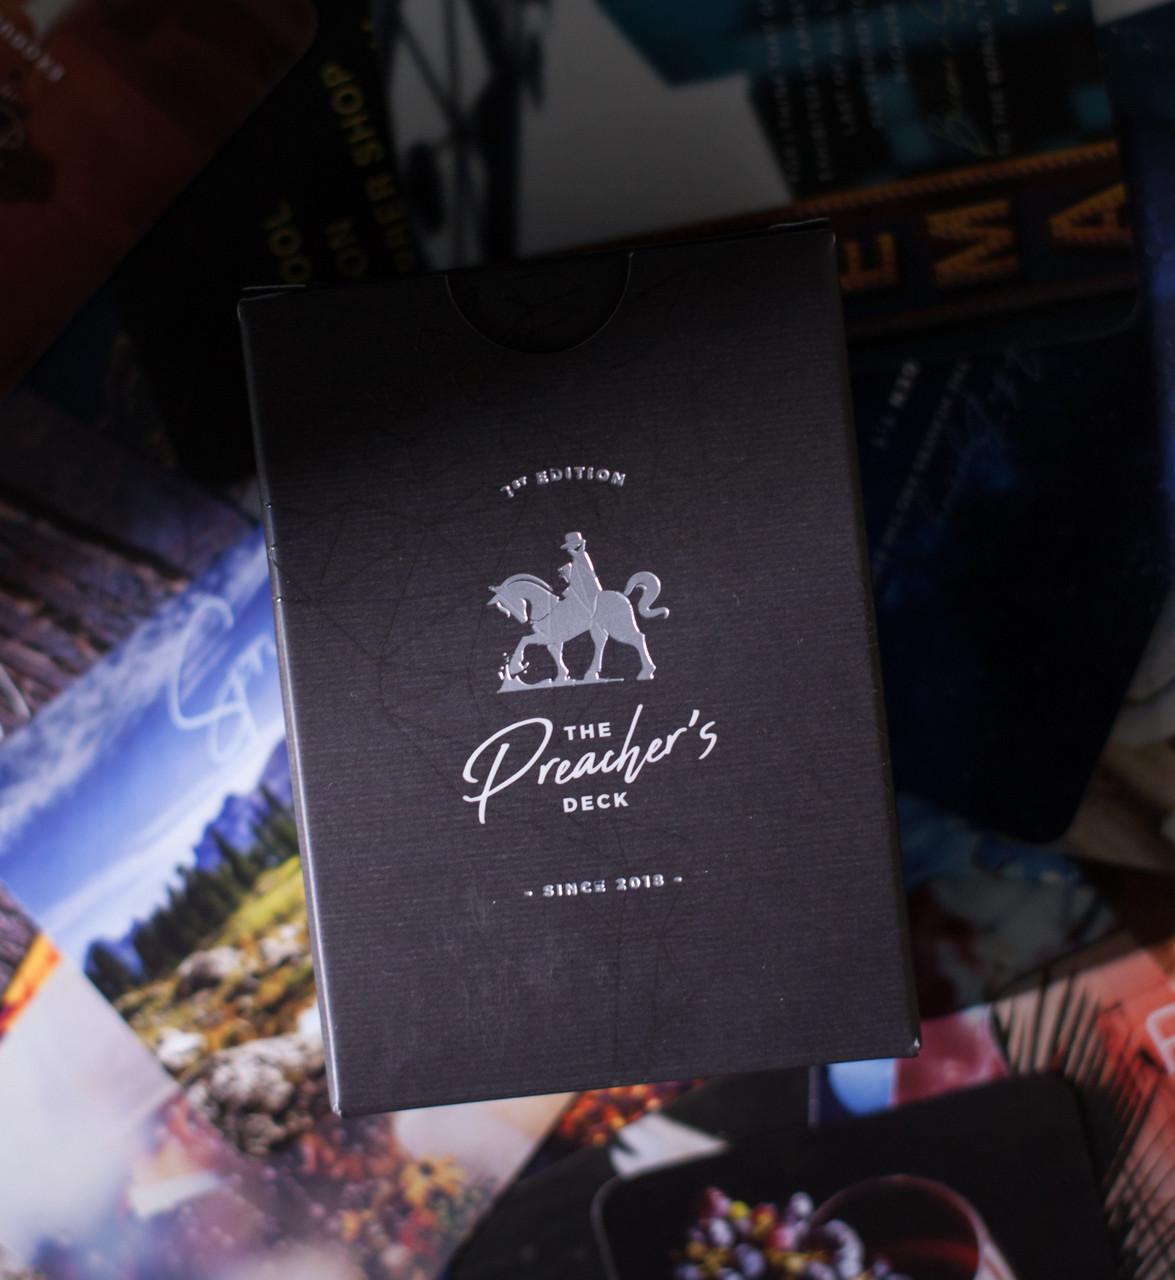 Preacher's Deck Gospel Card Magic by Rosen Roy